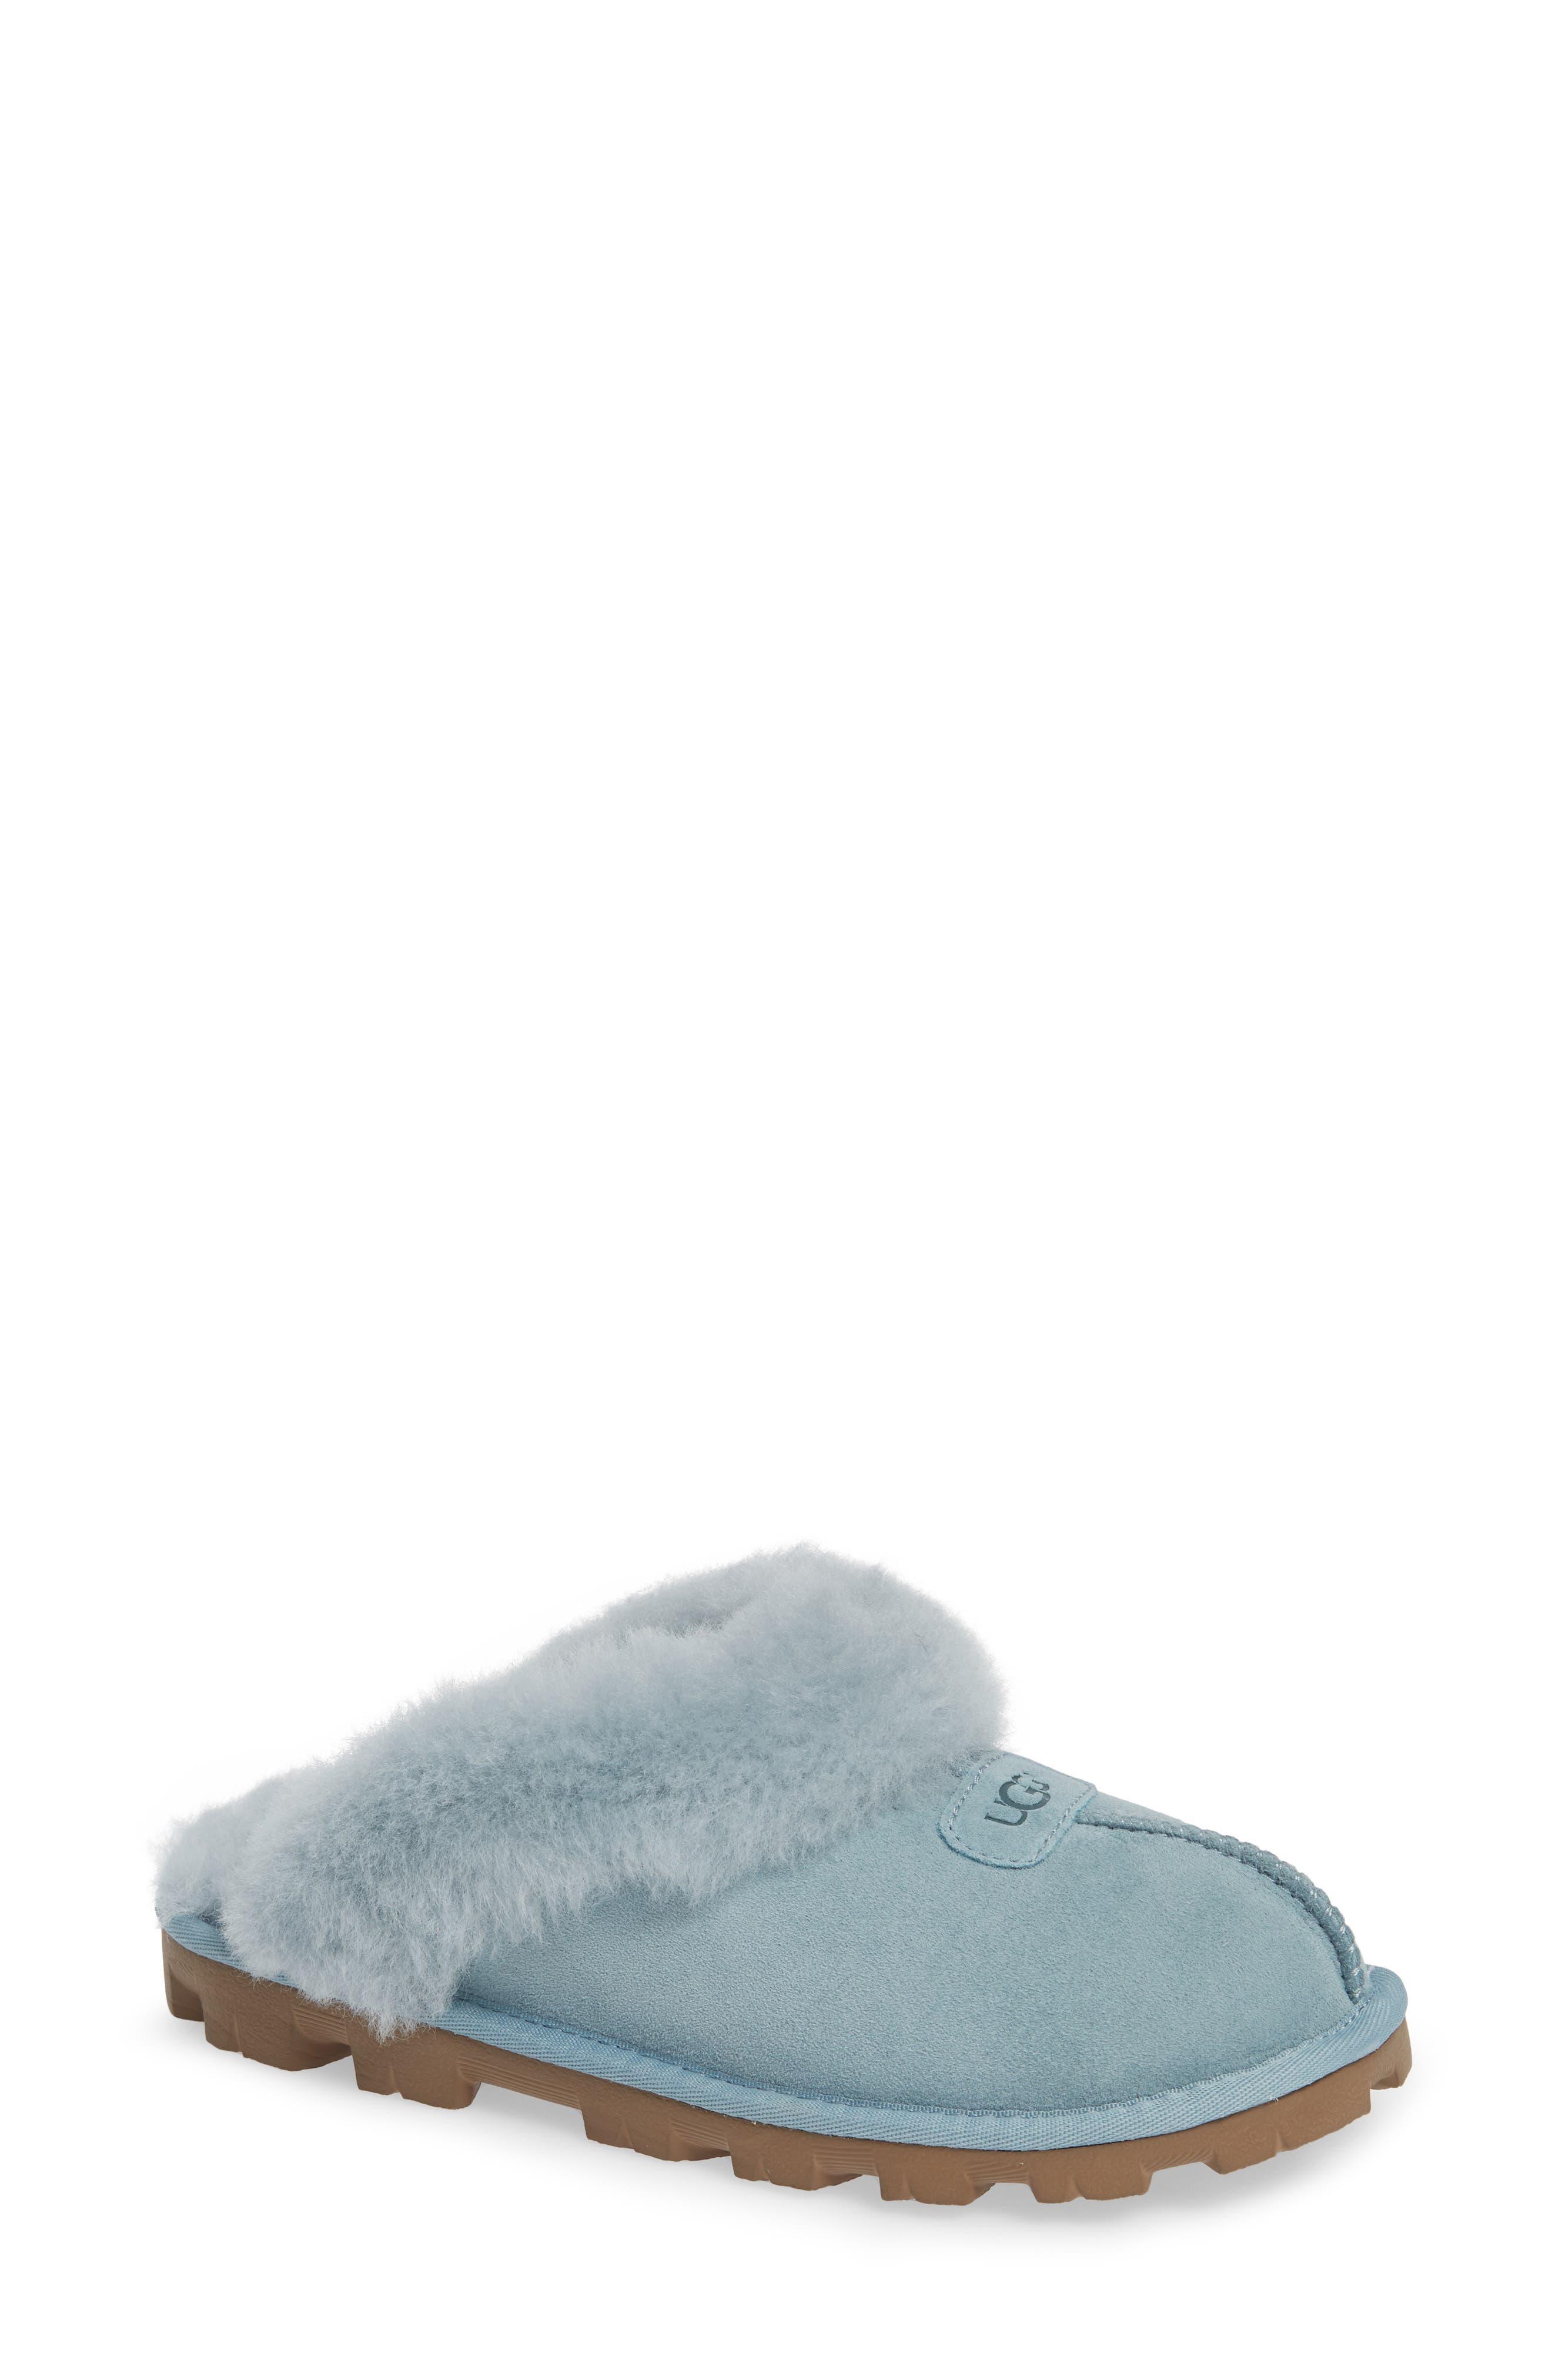 Ugg Genuine Shearling Slipper, Blue